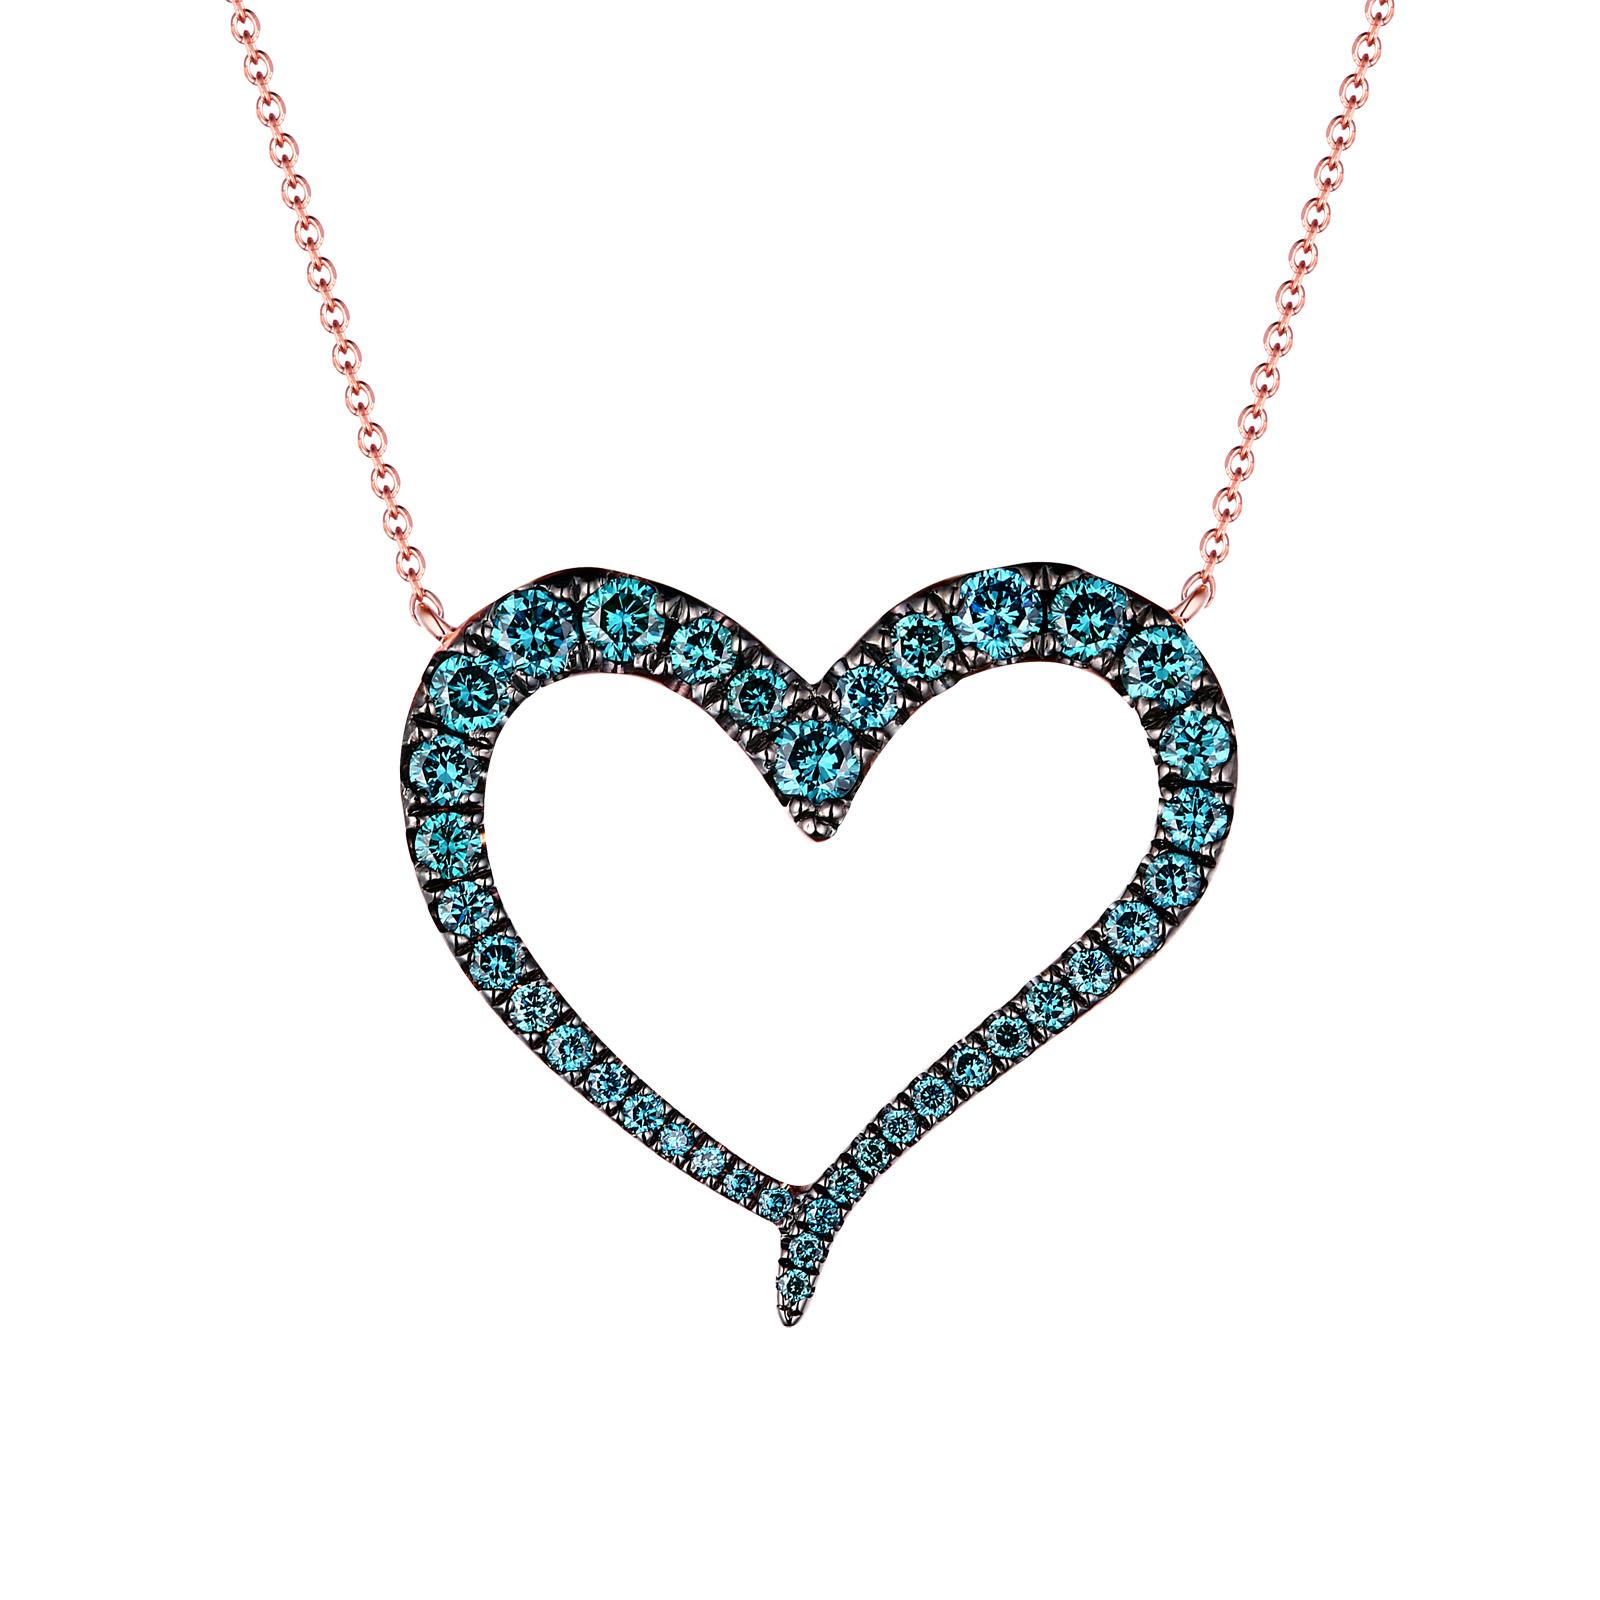 NL24622ICE- 14K Rose Gold Diamond Necklace, 0.58 TCW